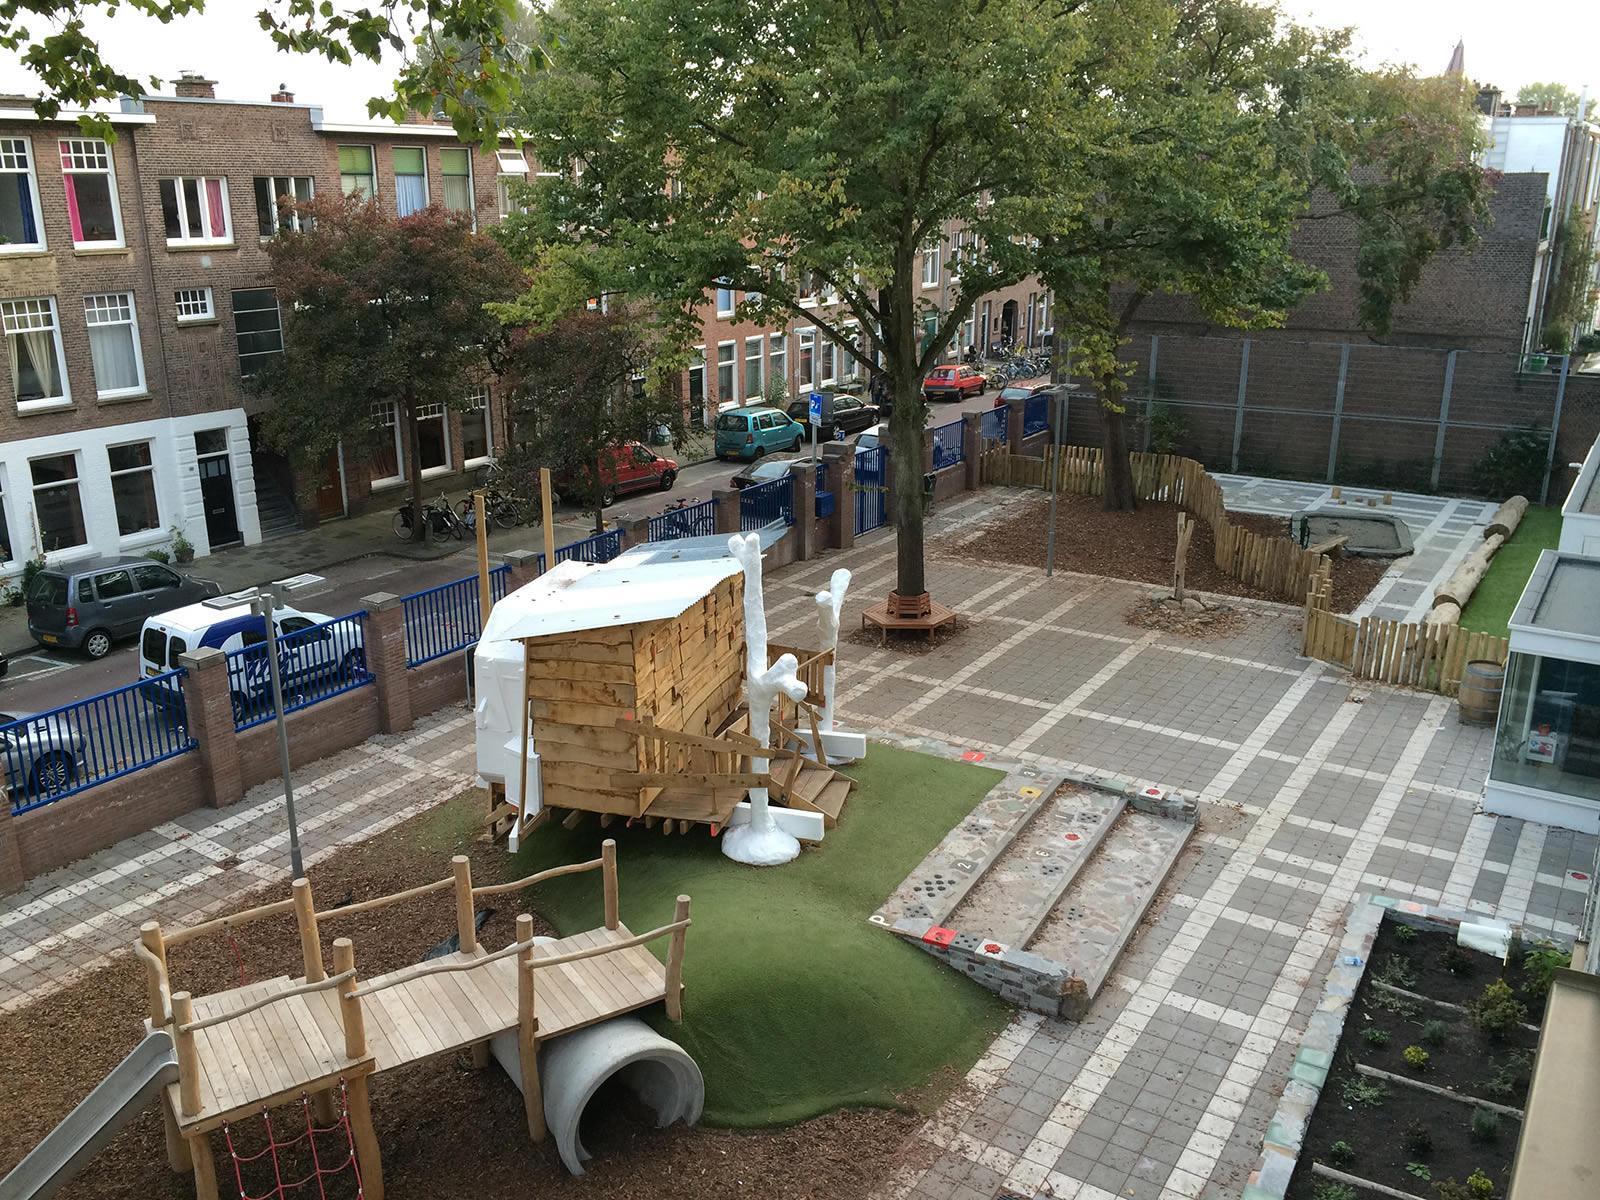 Schoolplein Openbare Montessori Valkenbos, Den Haag